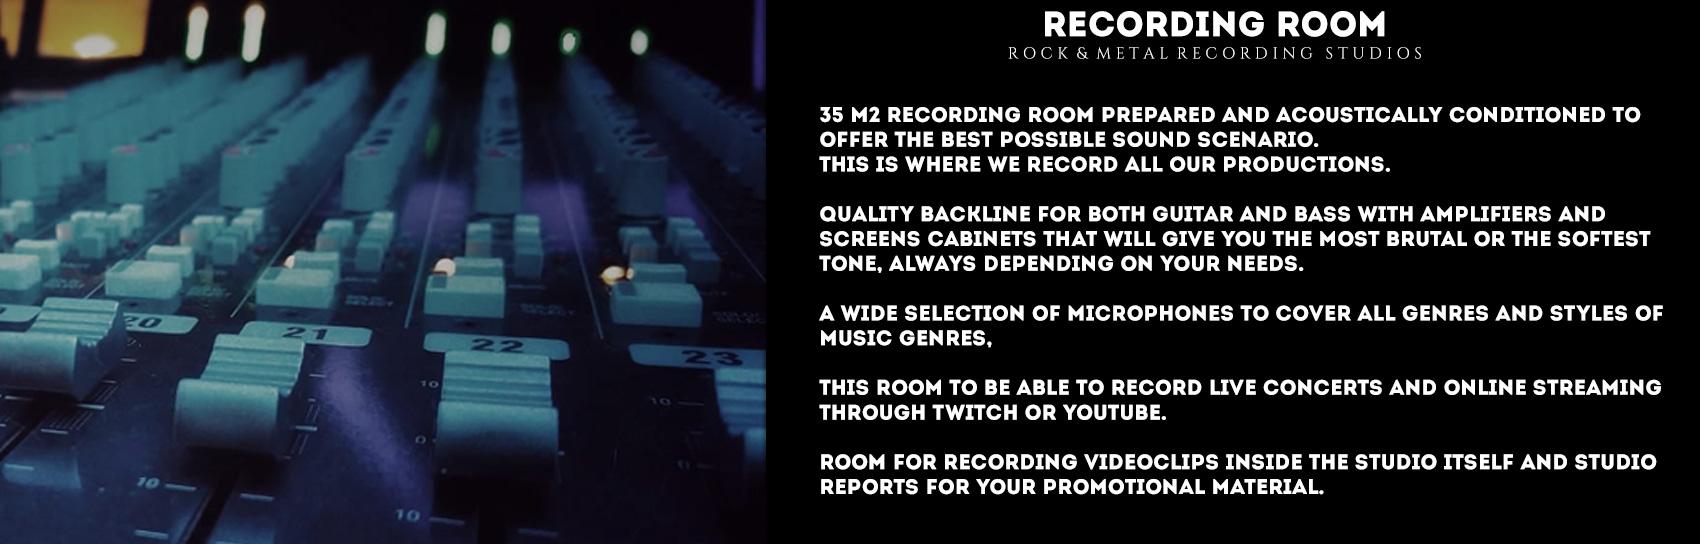 recording-room